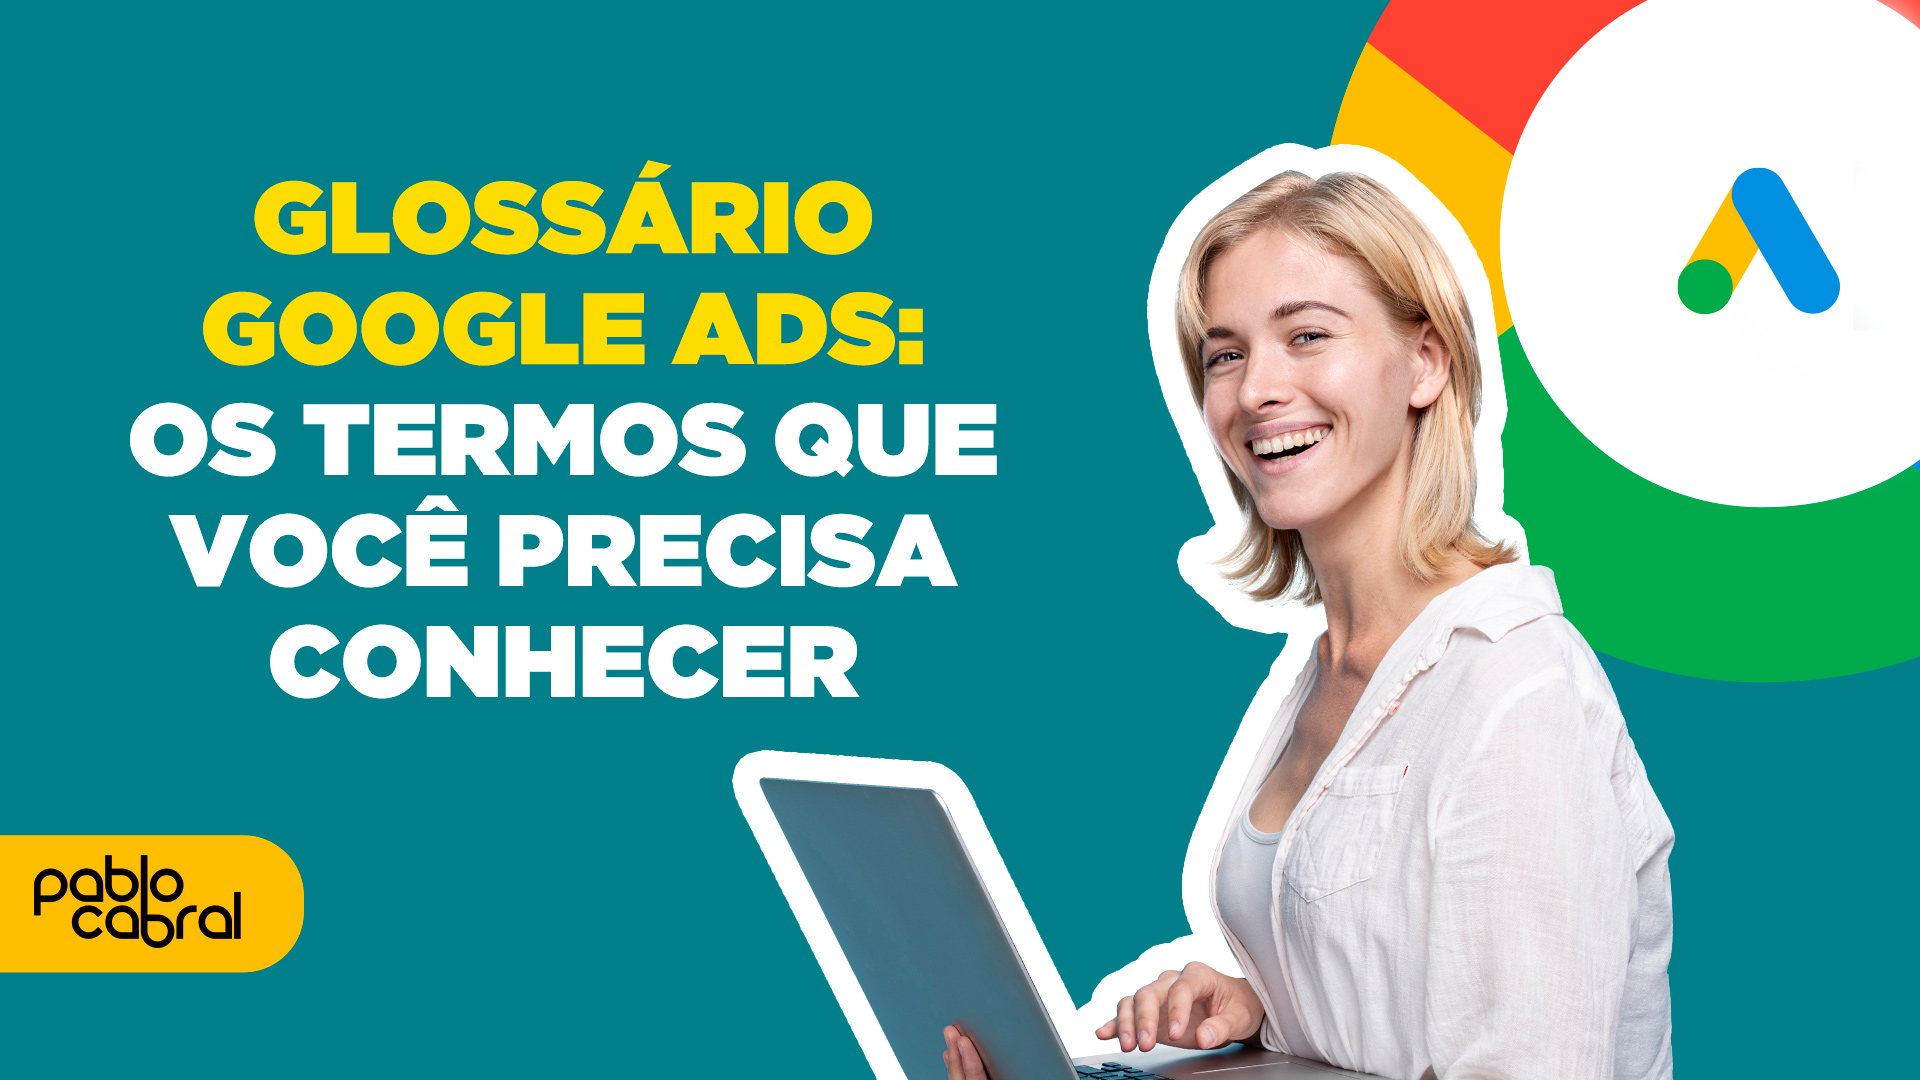 glossario google ads